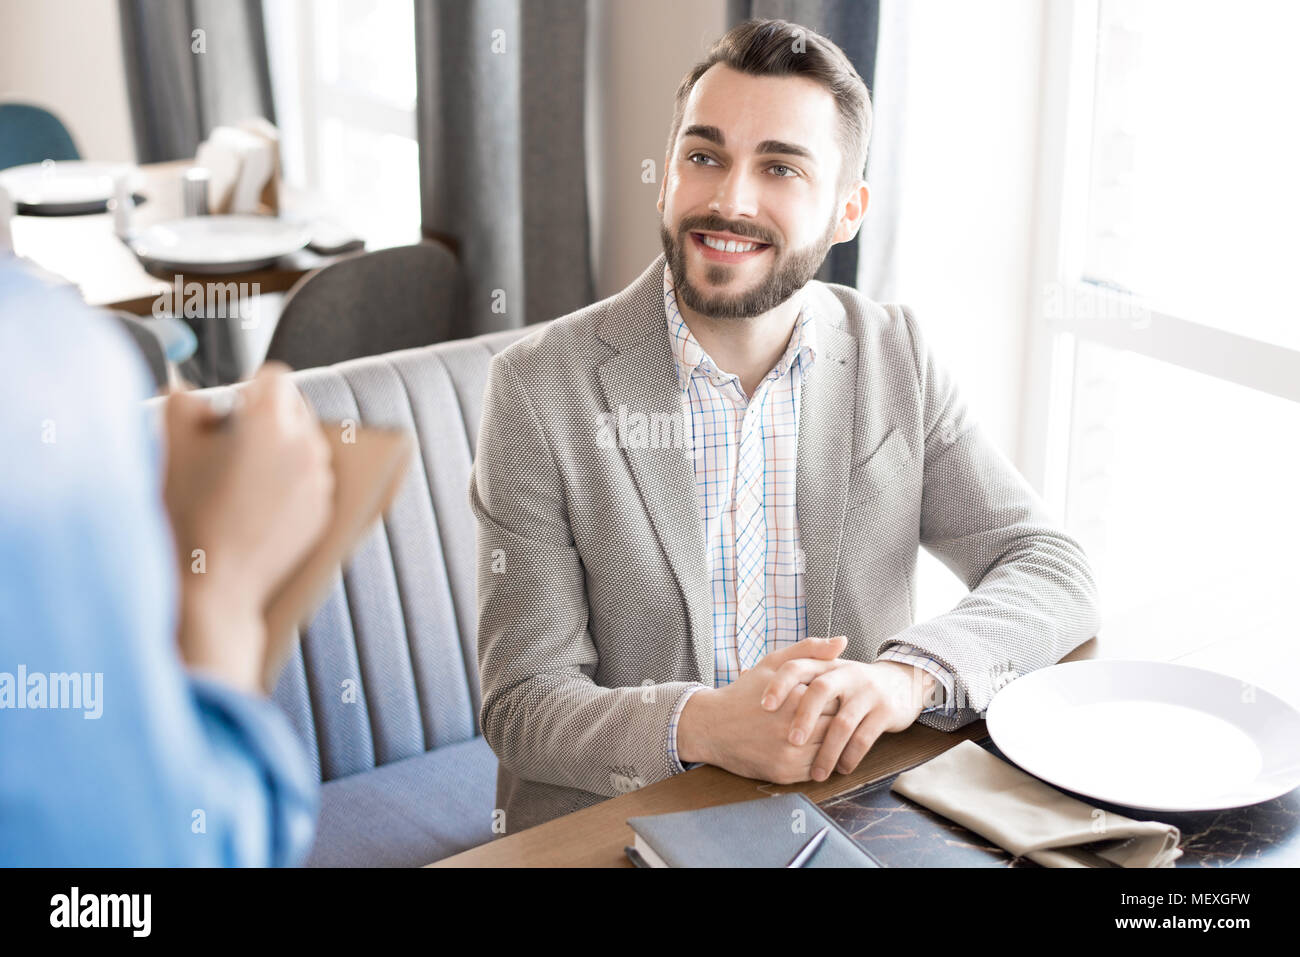 Cheerful businessman faire commander au restaurant Photo Stock